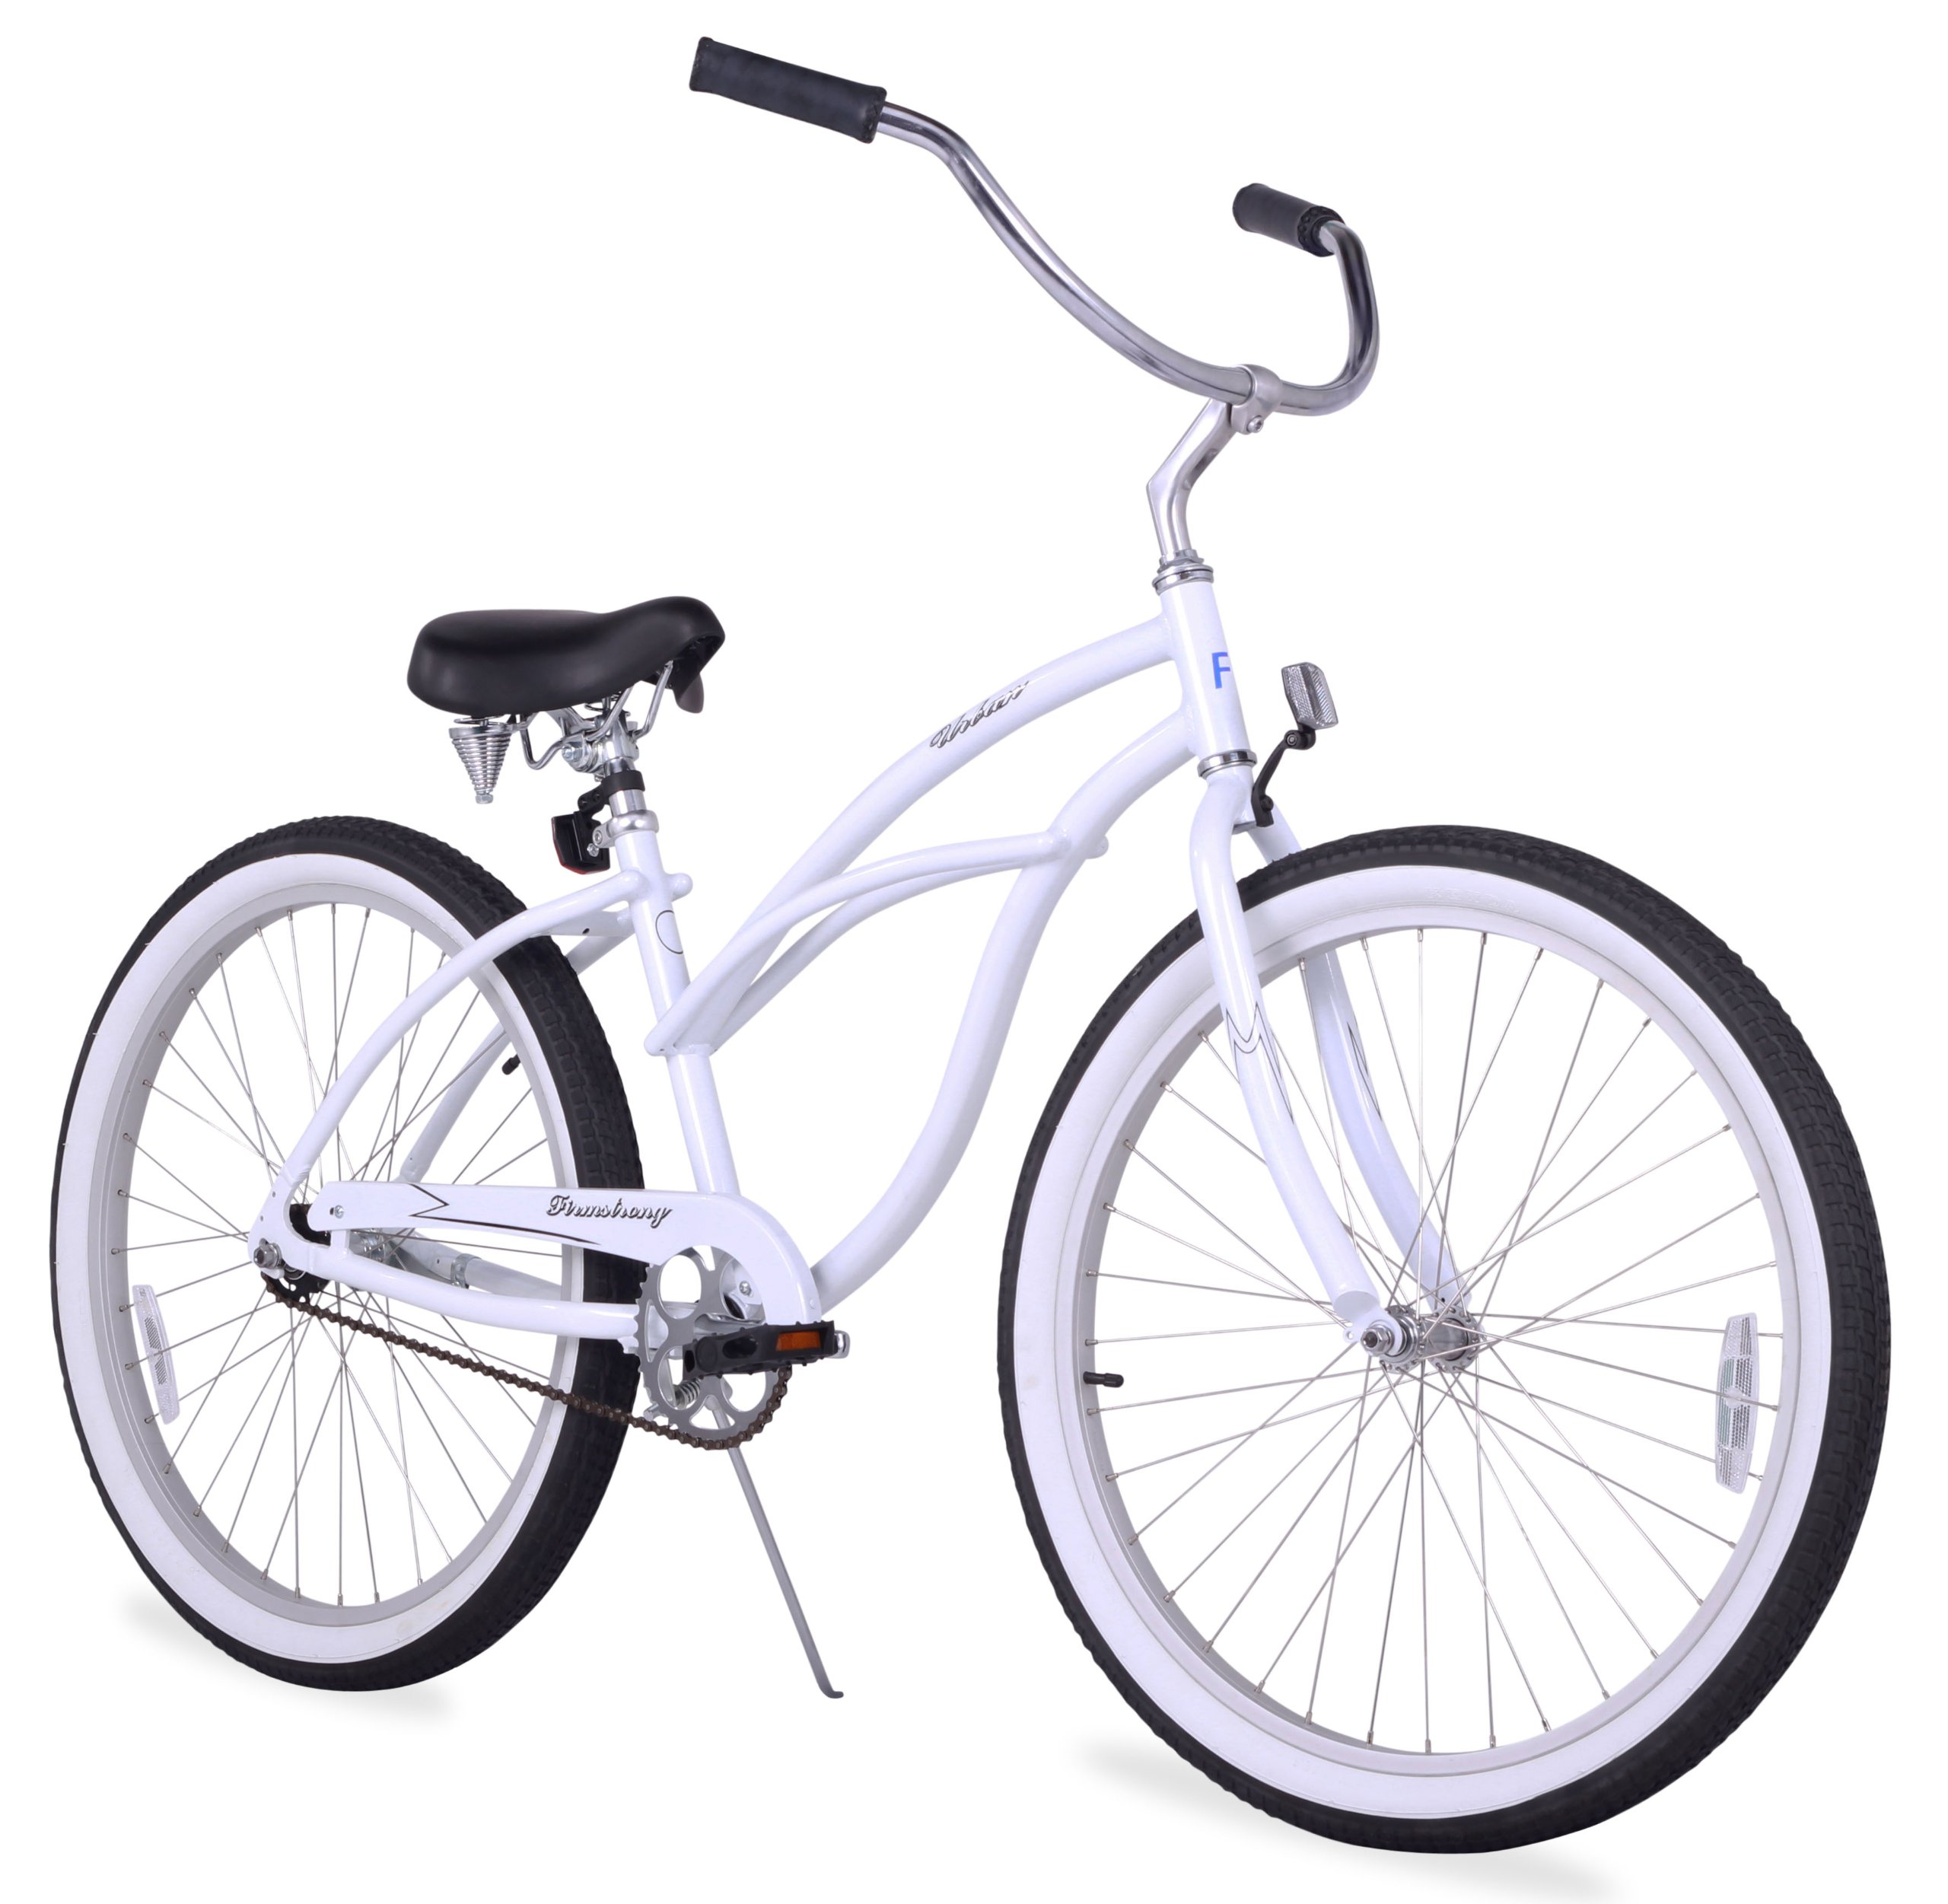 "Firmstrong Urban Lady Women's 26"" Single Speed Beach Cruiser Bike"